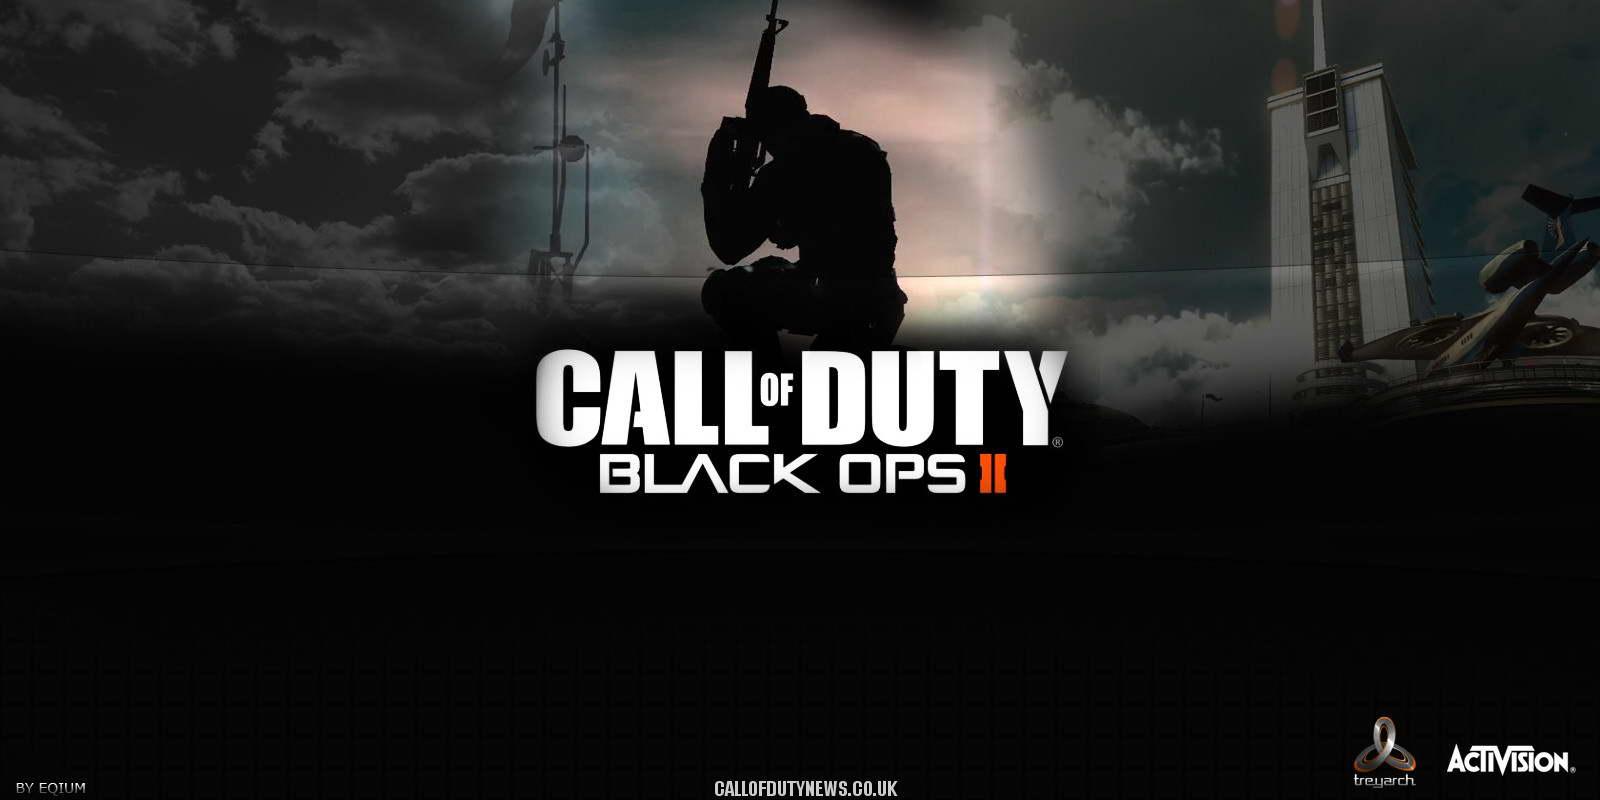 2bpblogspot B4i8hAE0wg0 UL57G9olOPI Call Of Duty Black Ops 2